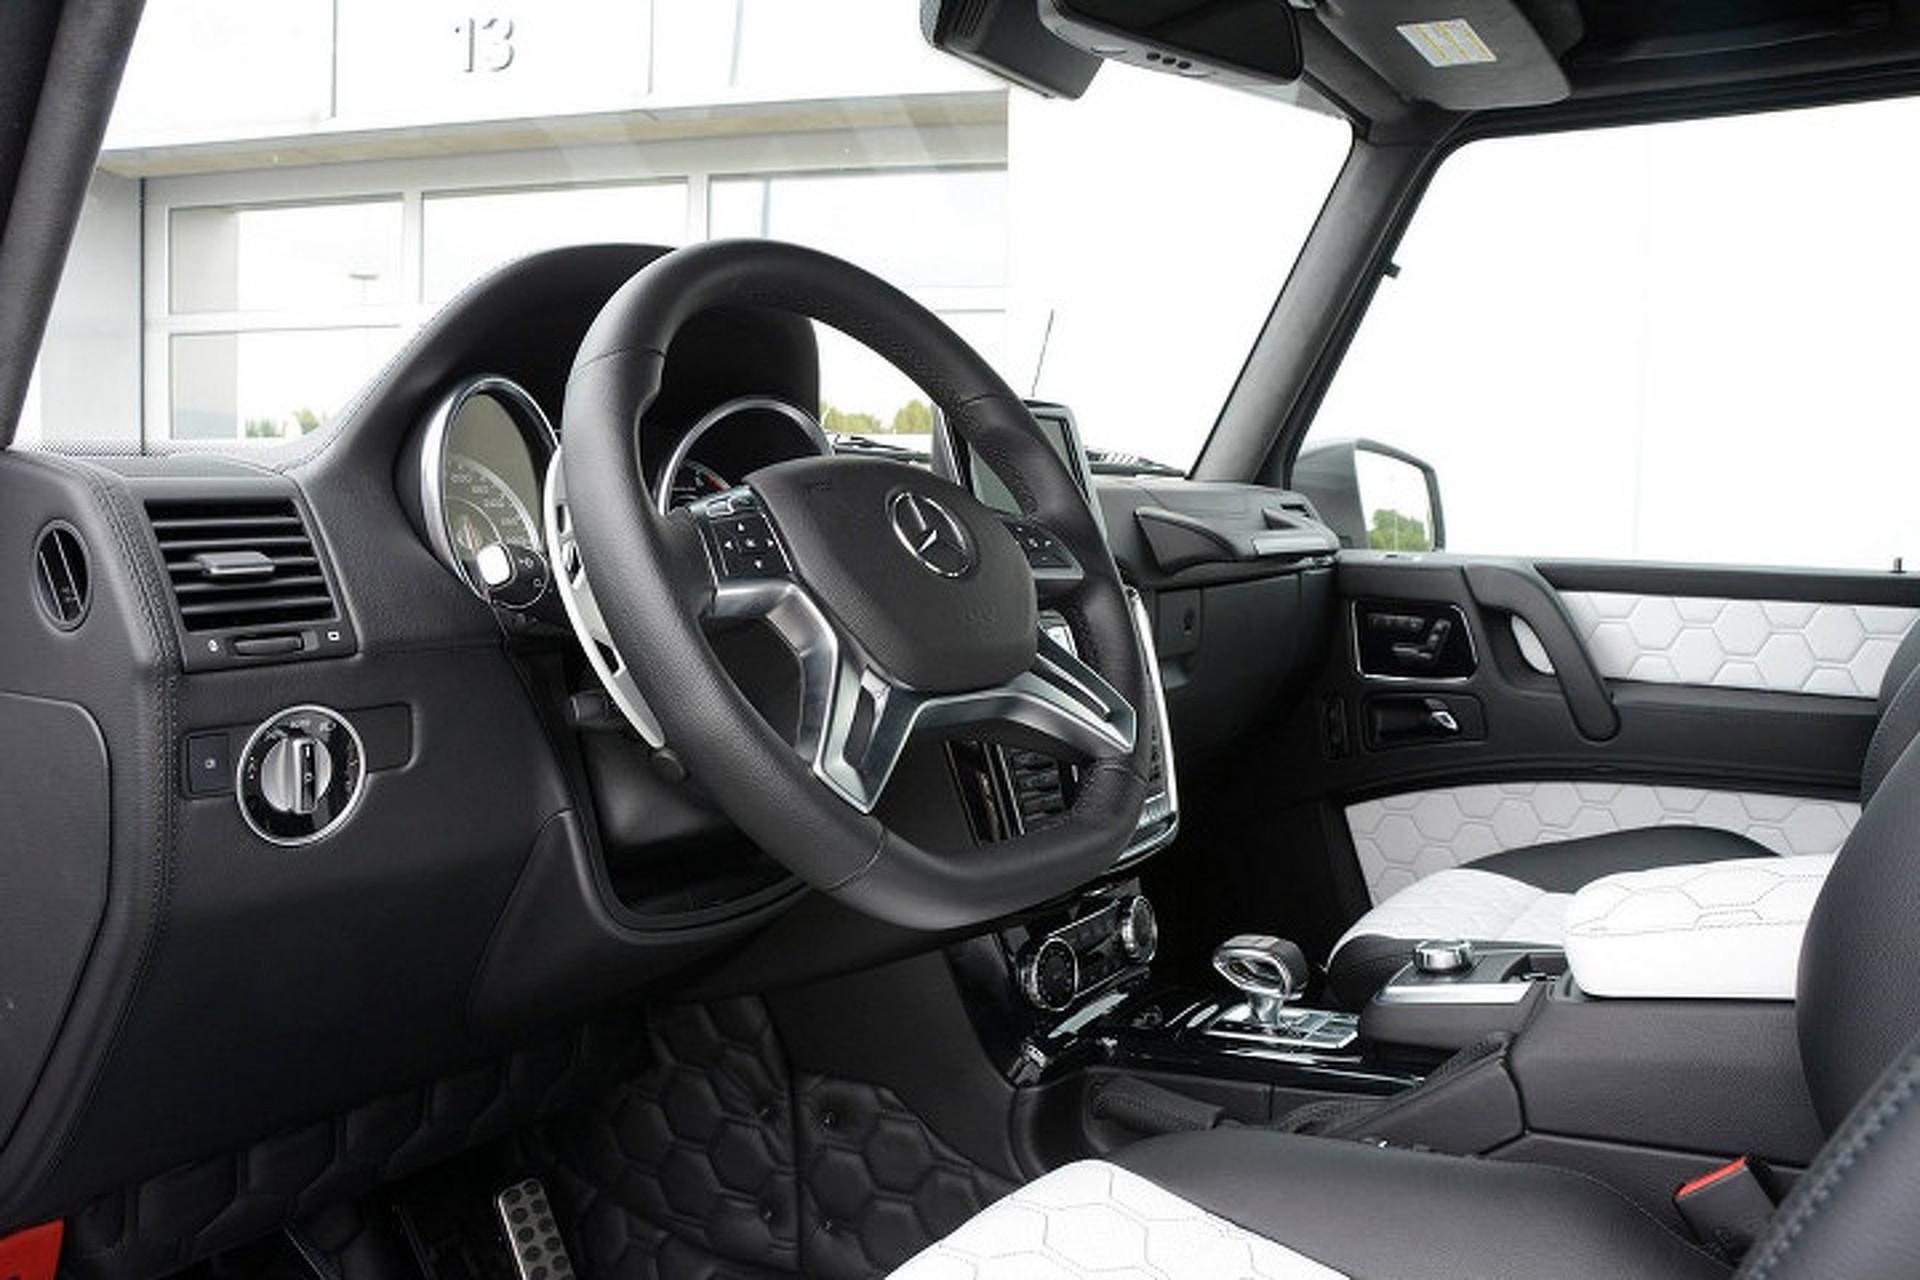 Dan Bilzerian Now Owns a Mercedes 6X6, Of Course